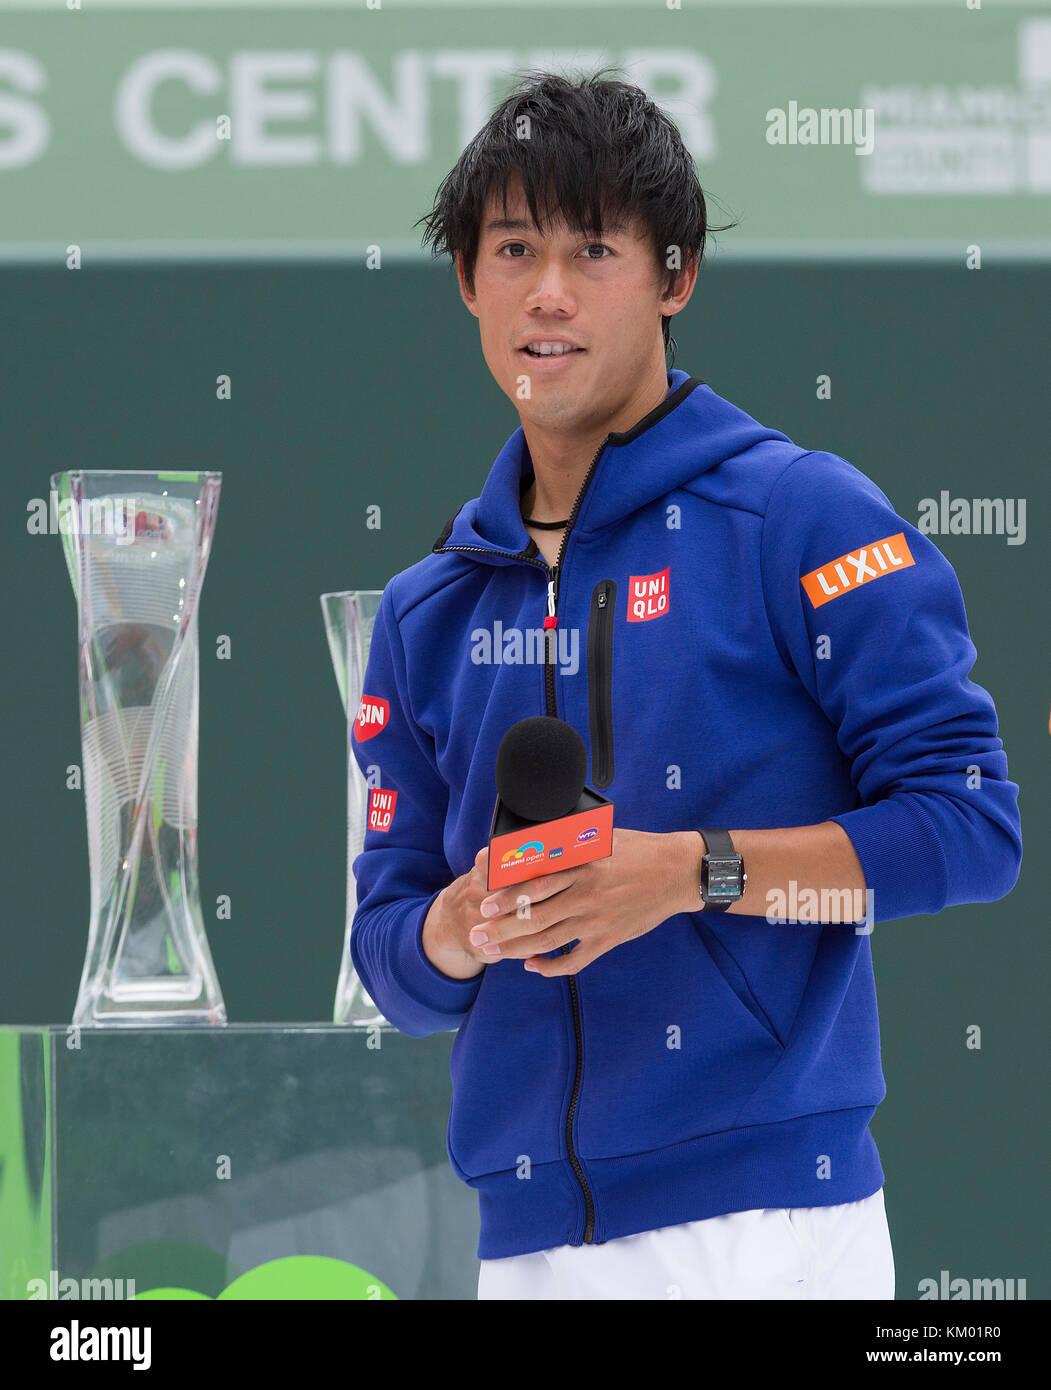 KEY BISCAYNE, FL - APRIL 03: Novak Djokovic of Serbia defeats Kei Nishikori of Japan during the mens final on Day - Stock Image